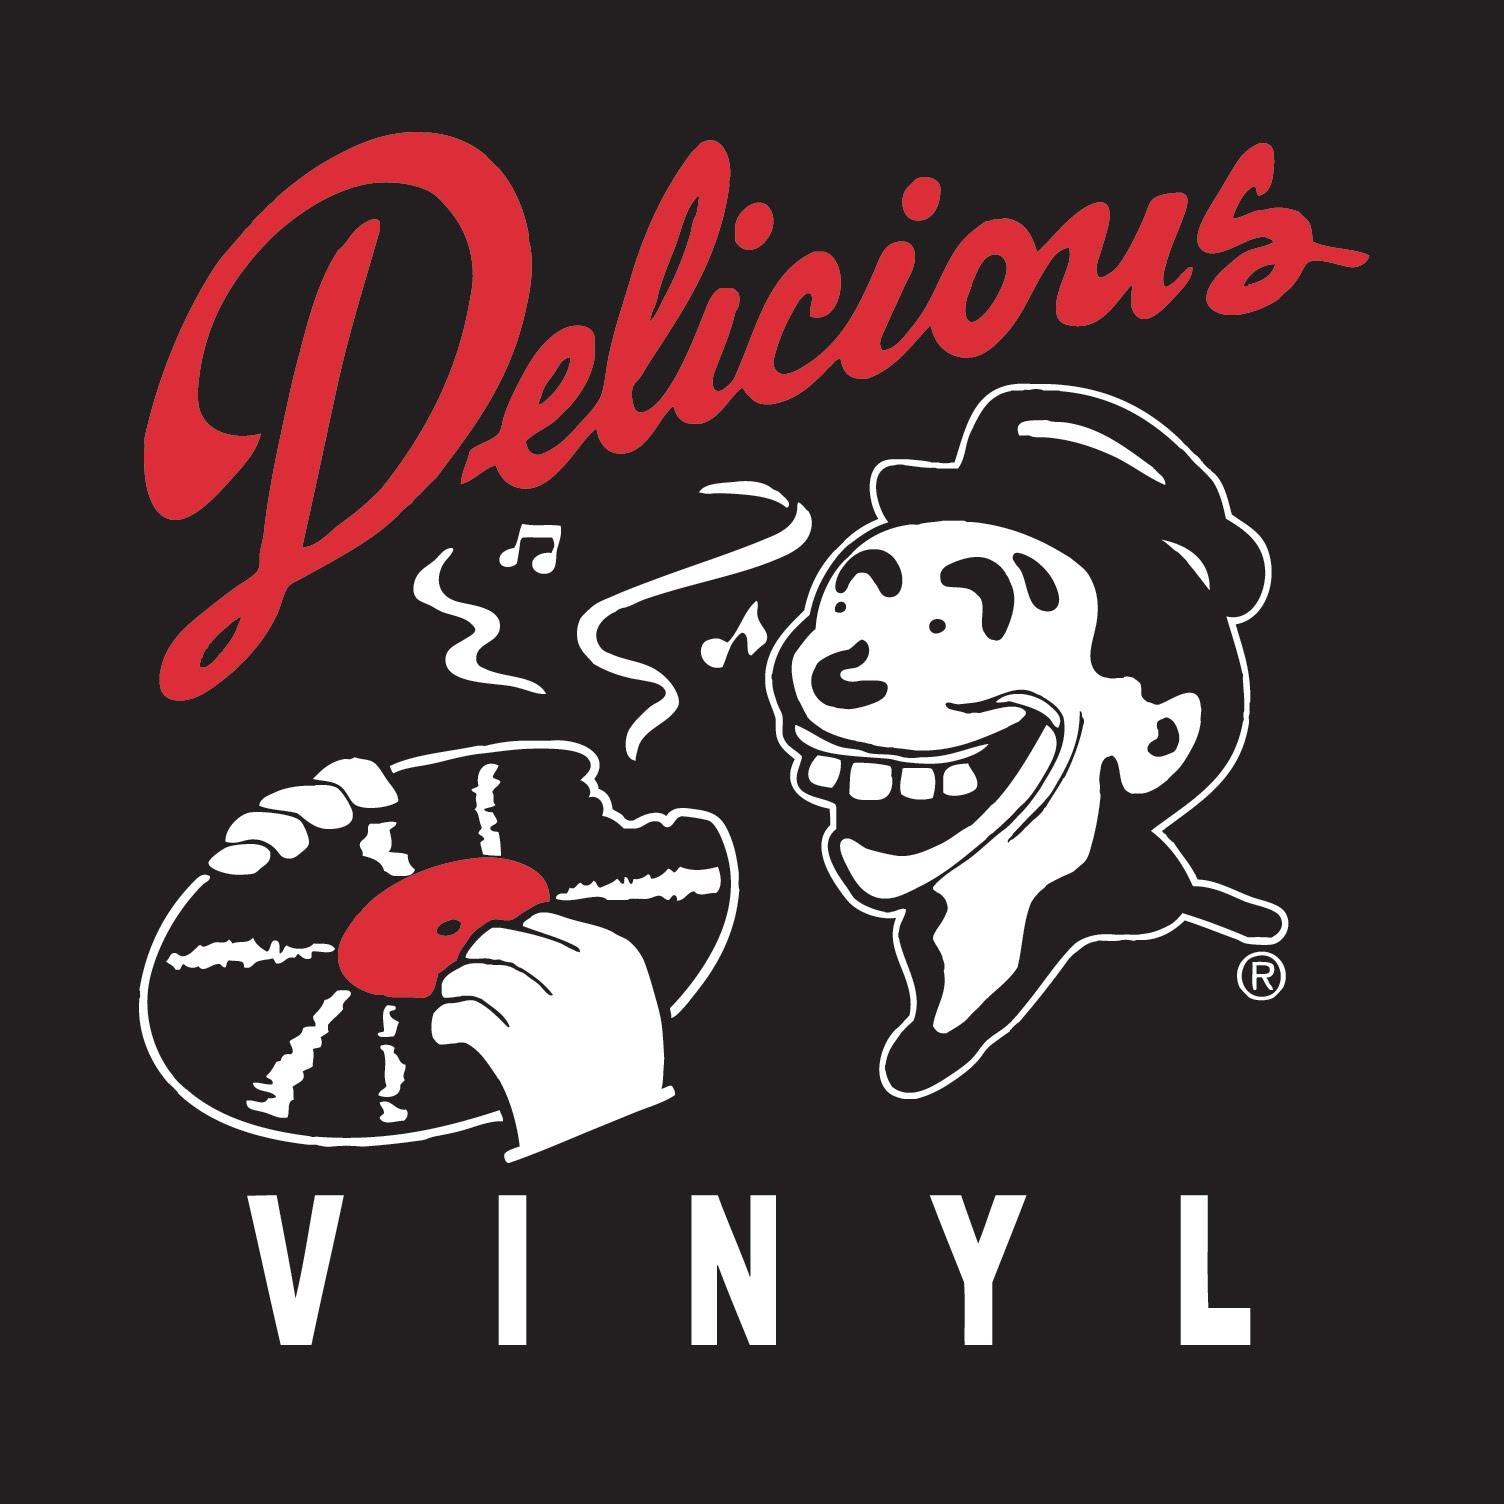 Delicious Vinyl | Hip Hop Wiki | FANDOM powered by Wikia